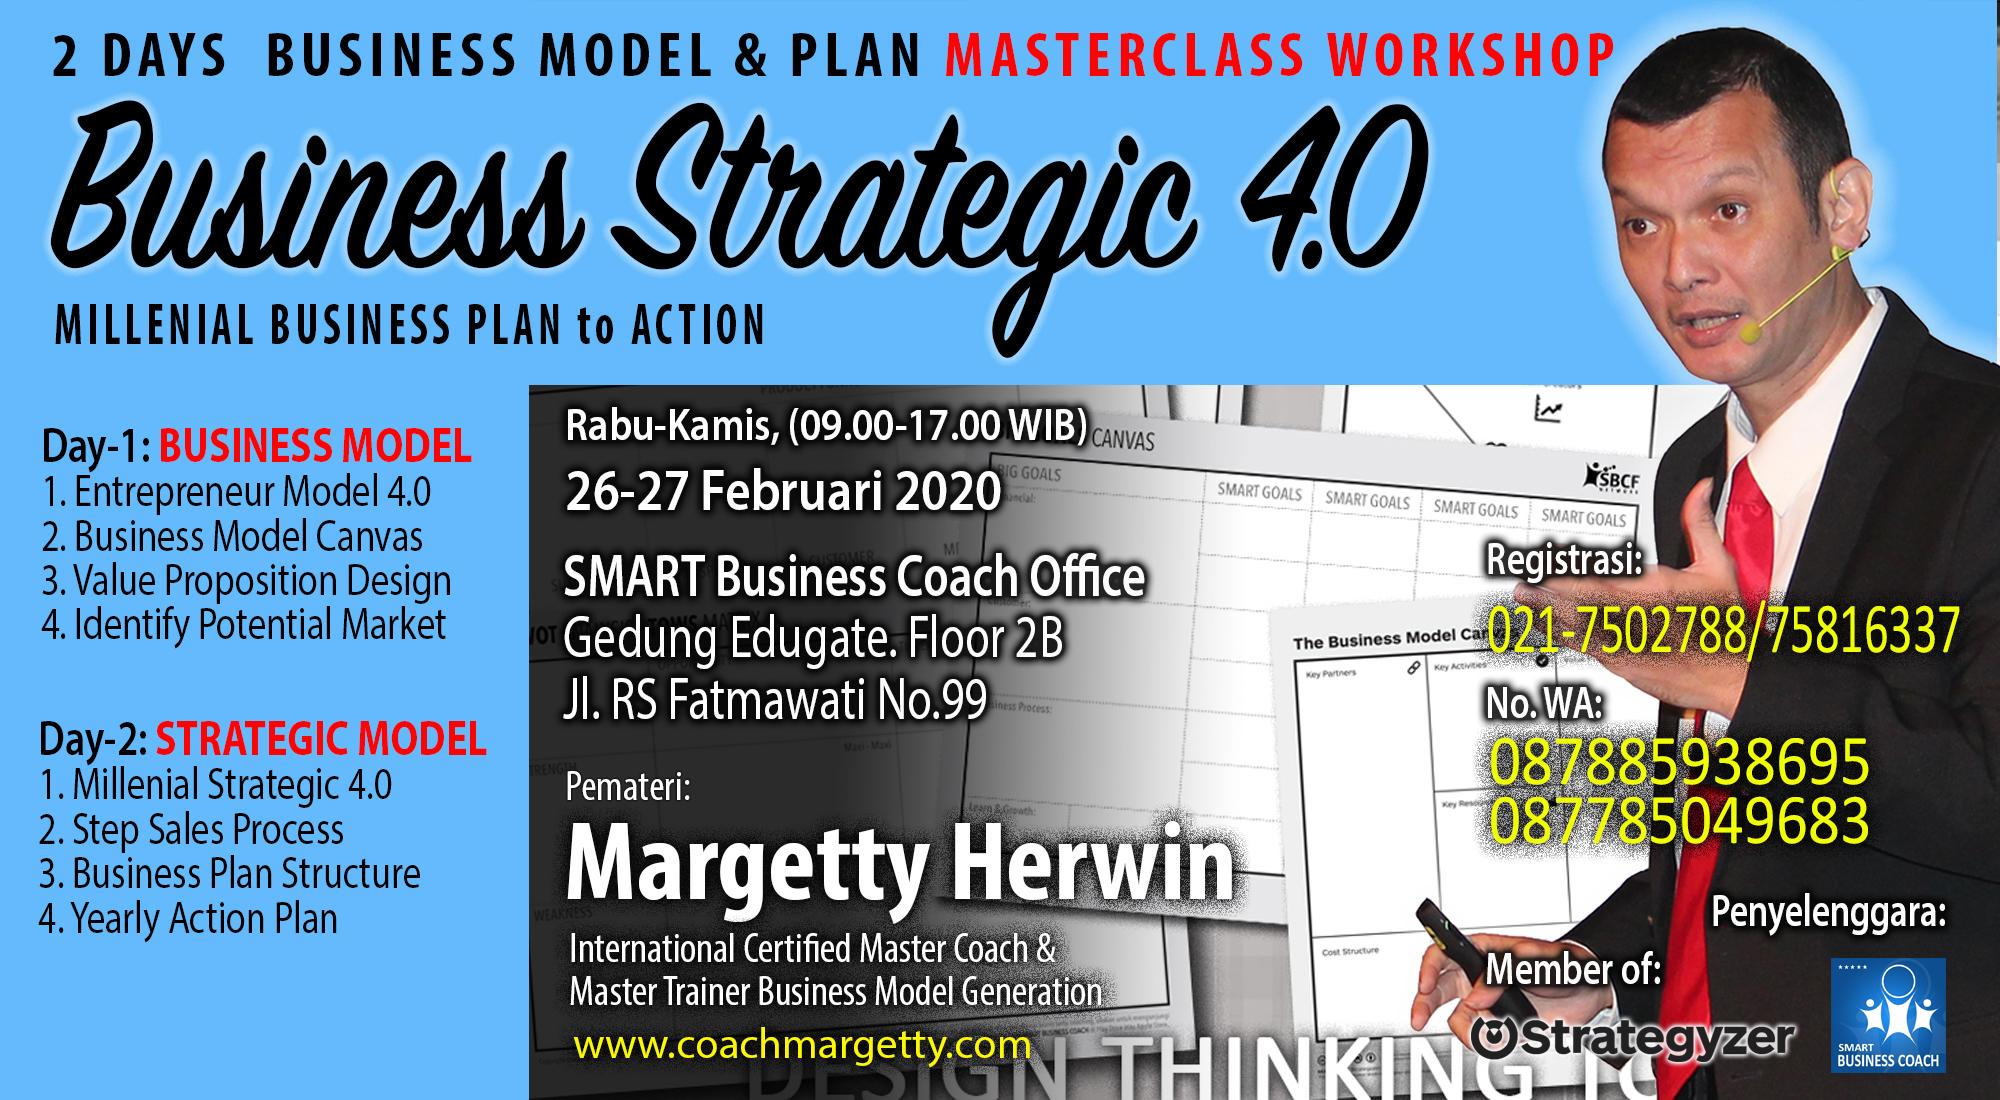 2 Days Masterclass Business Strategic 4.0